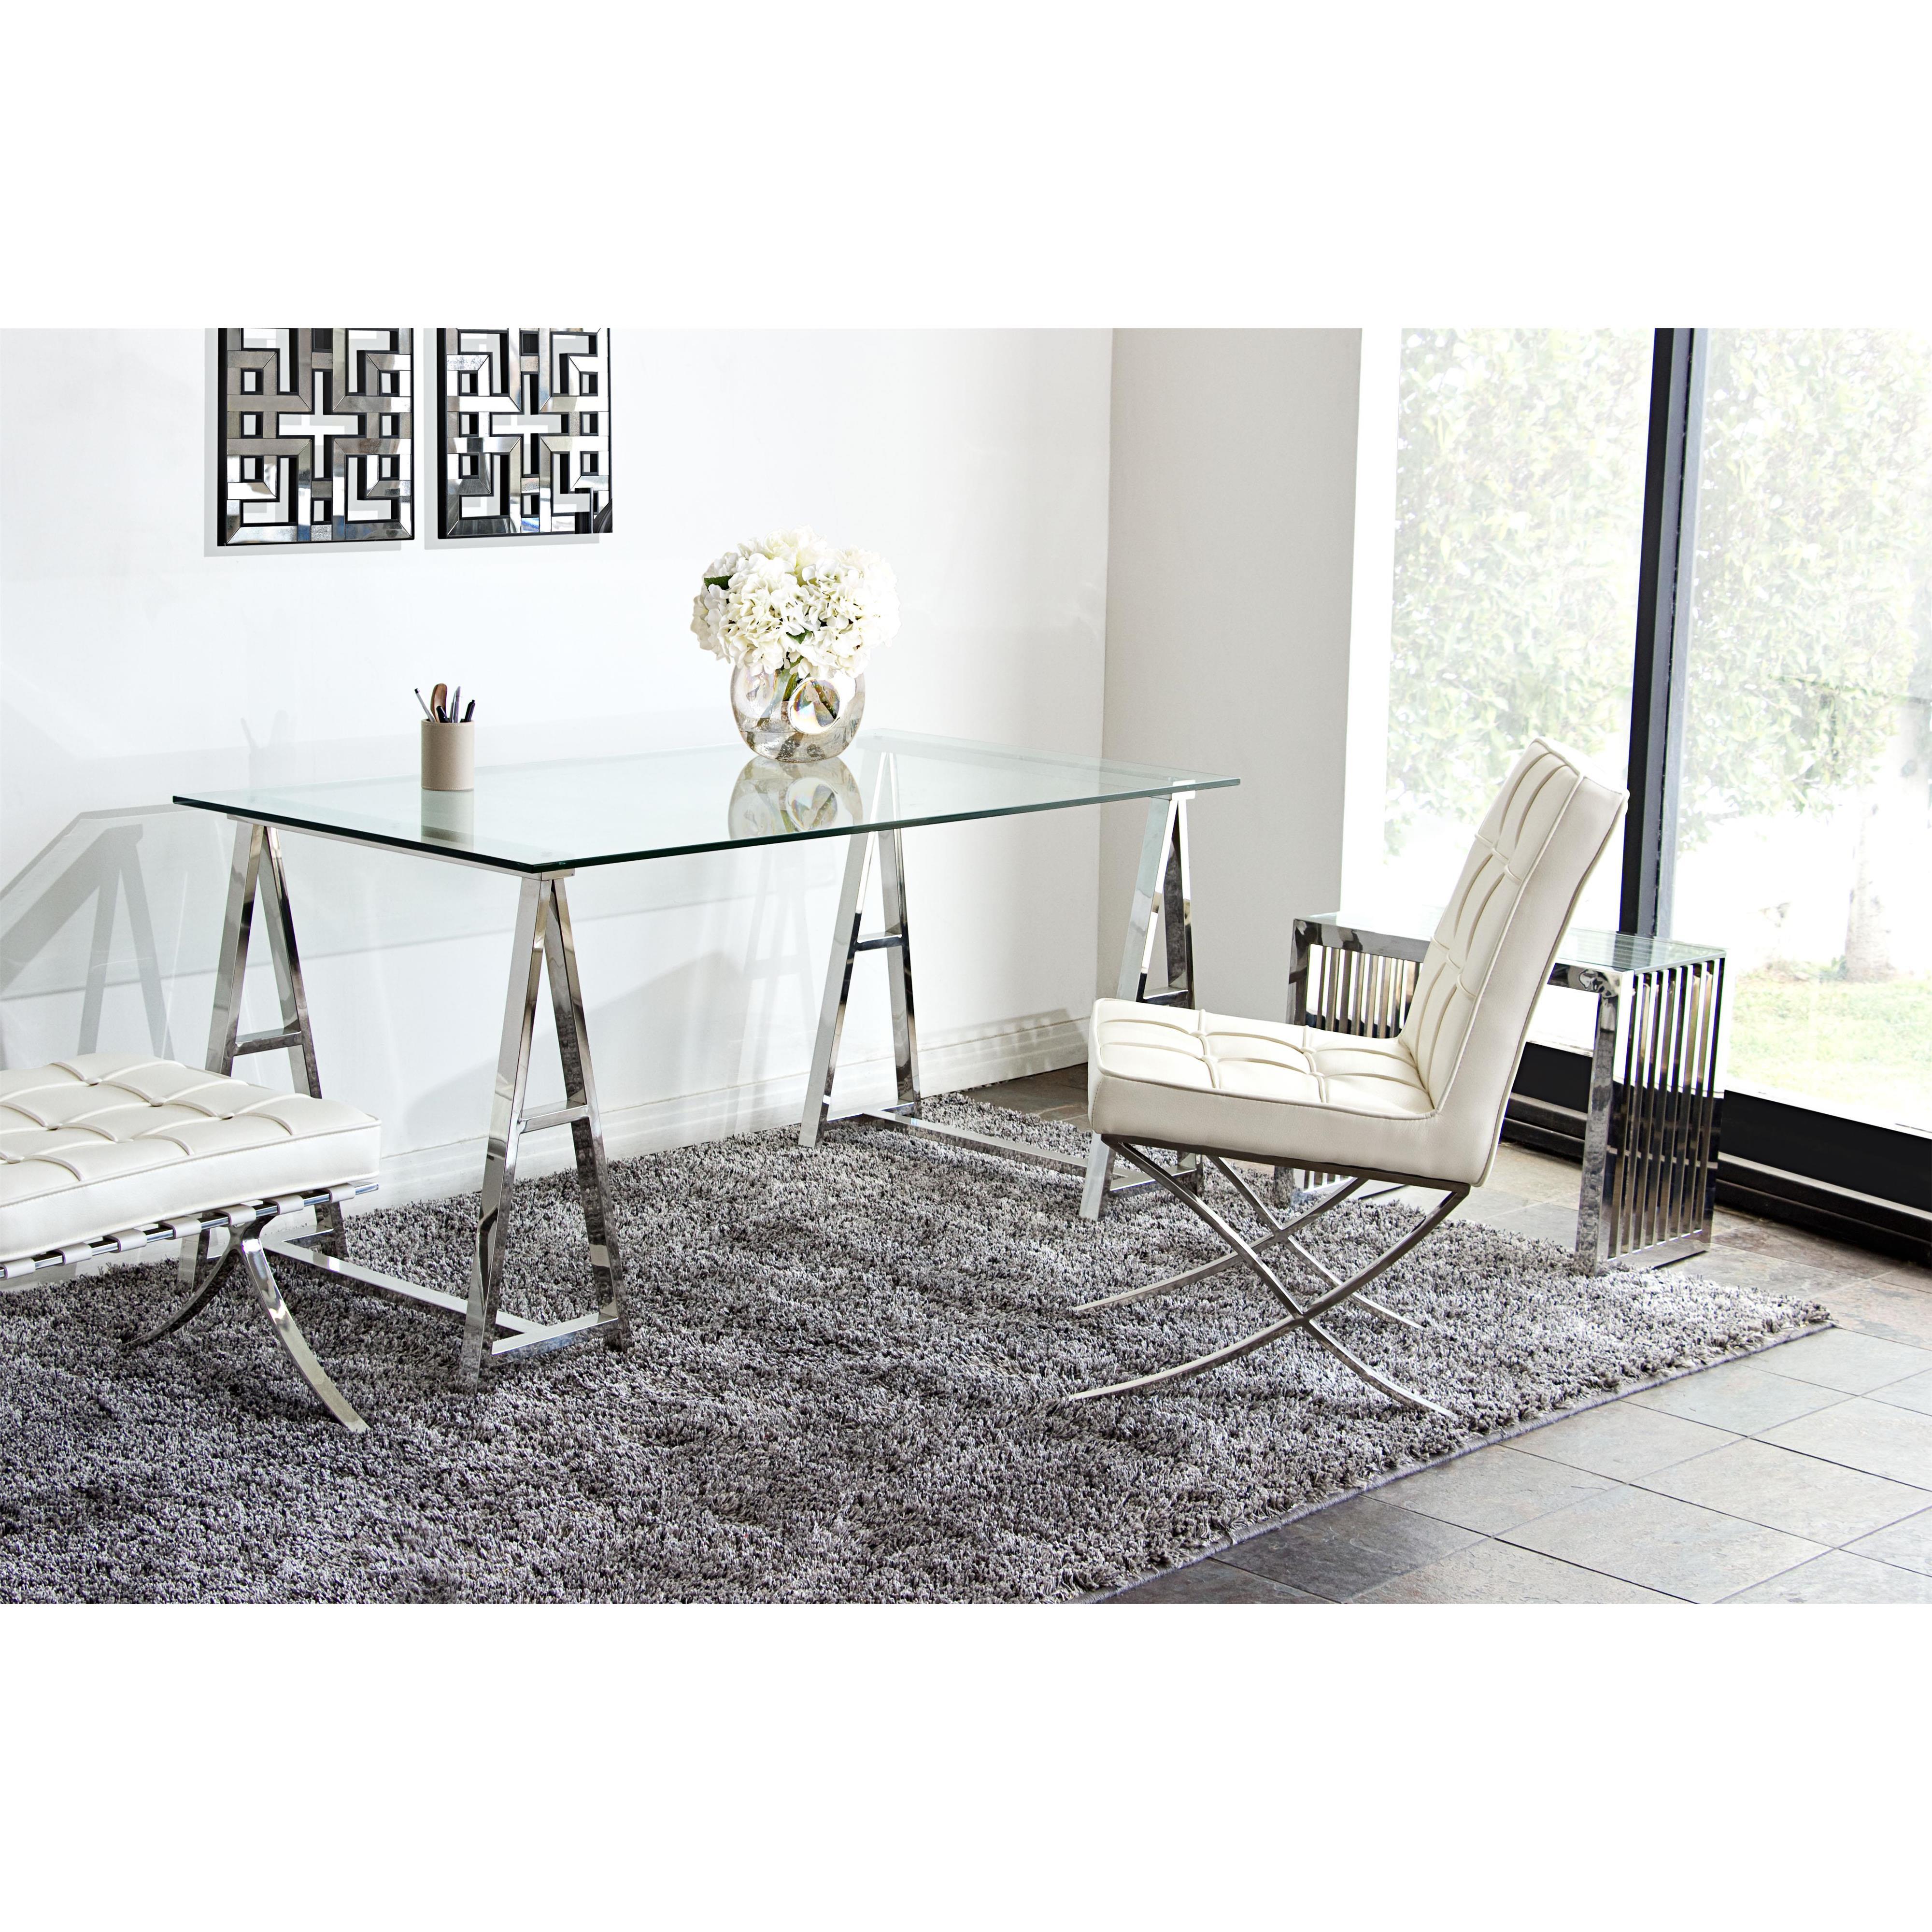 Diamond sofa deko desk red knot table desks writing desks for Sofa deko